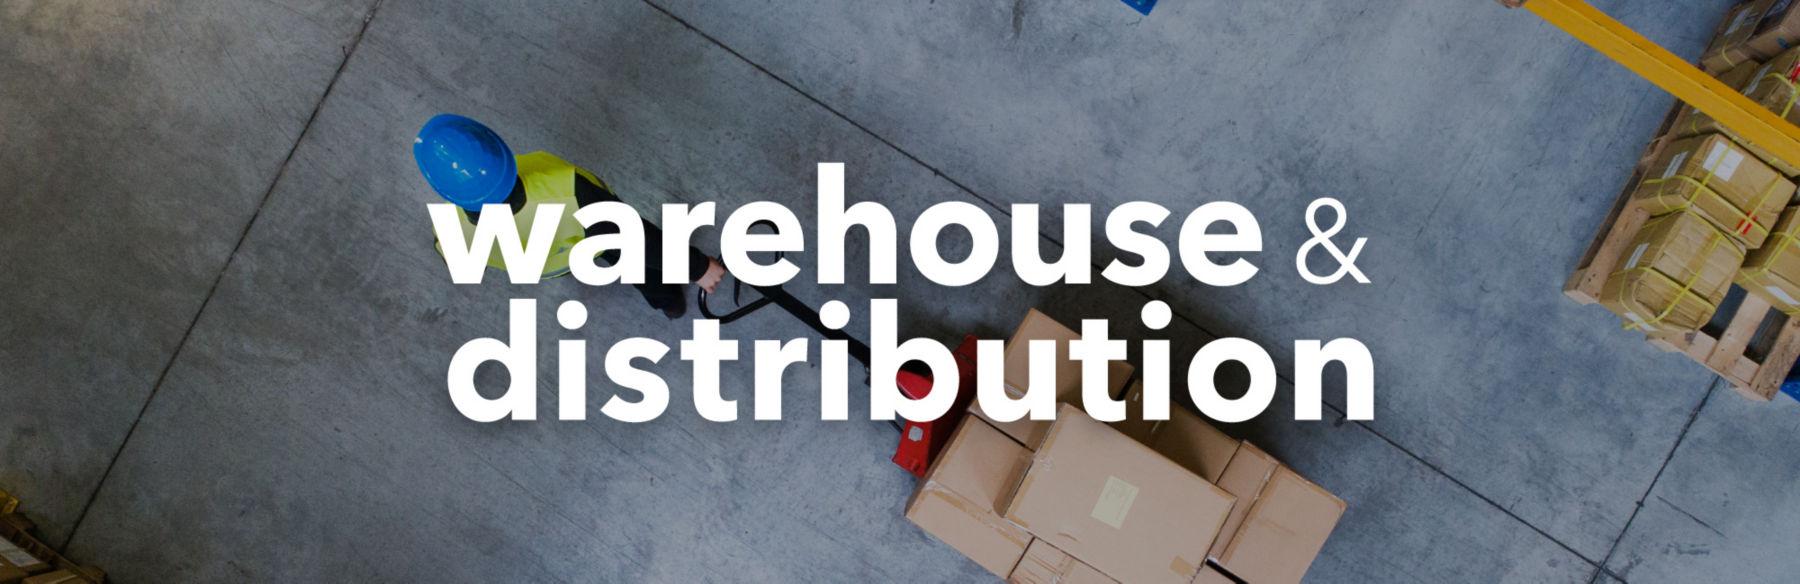 "warehouse&distribution"""